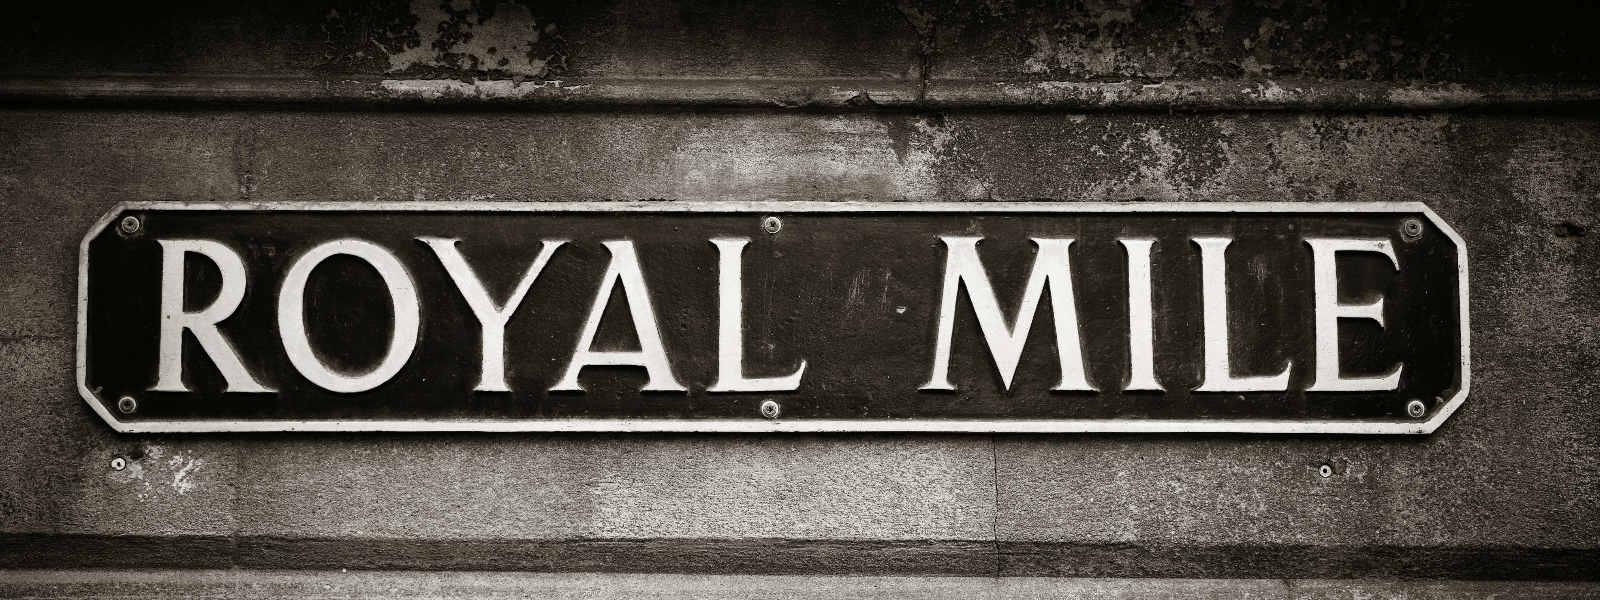 Royal Mile street sign